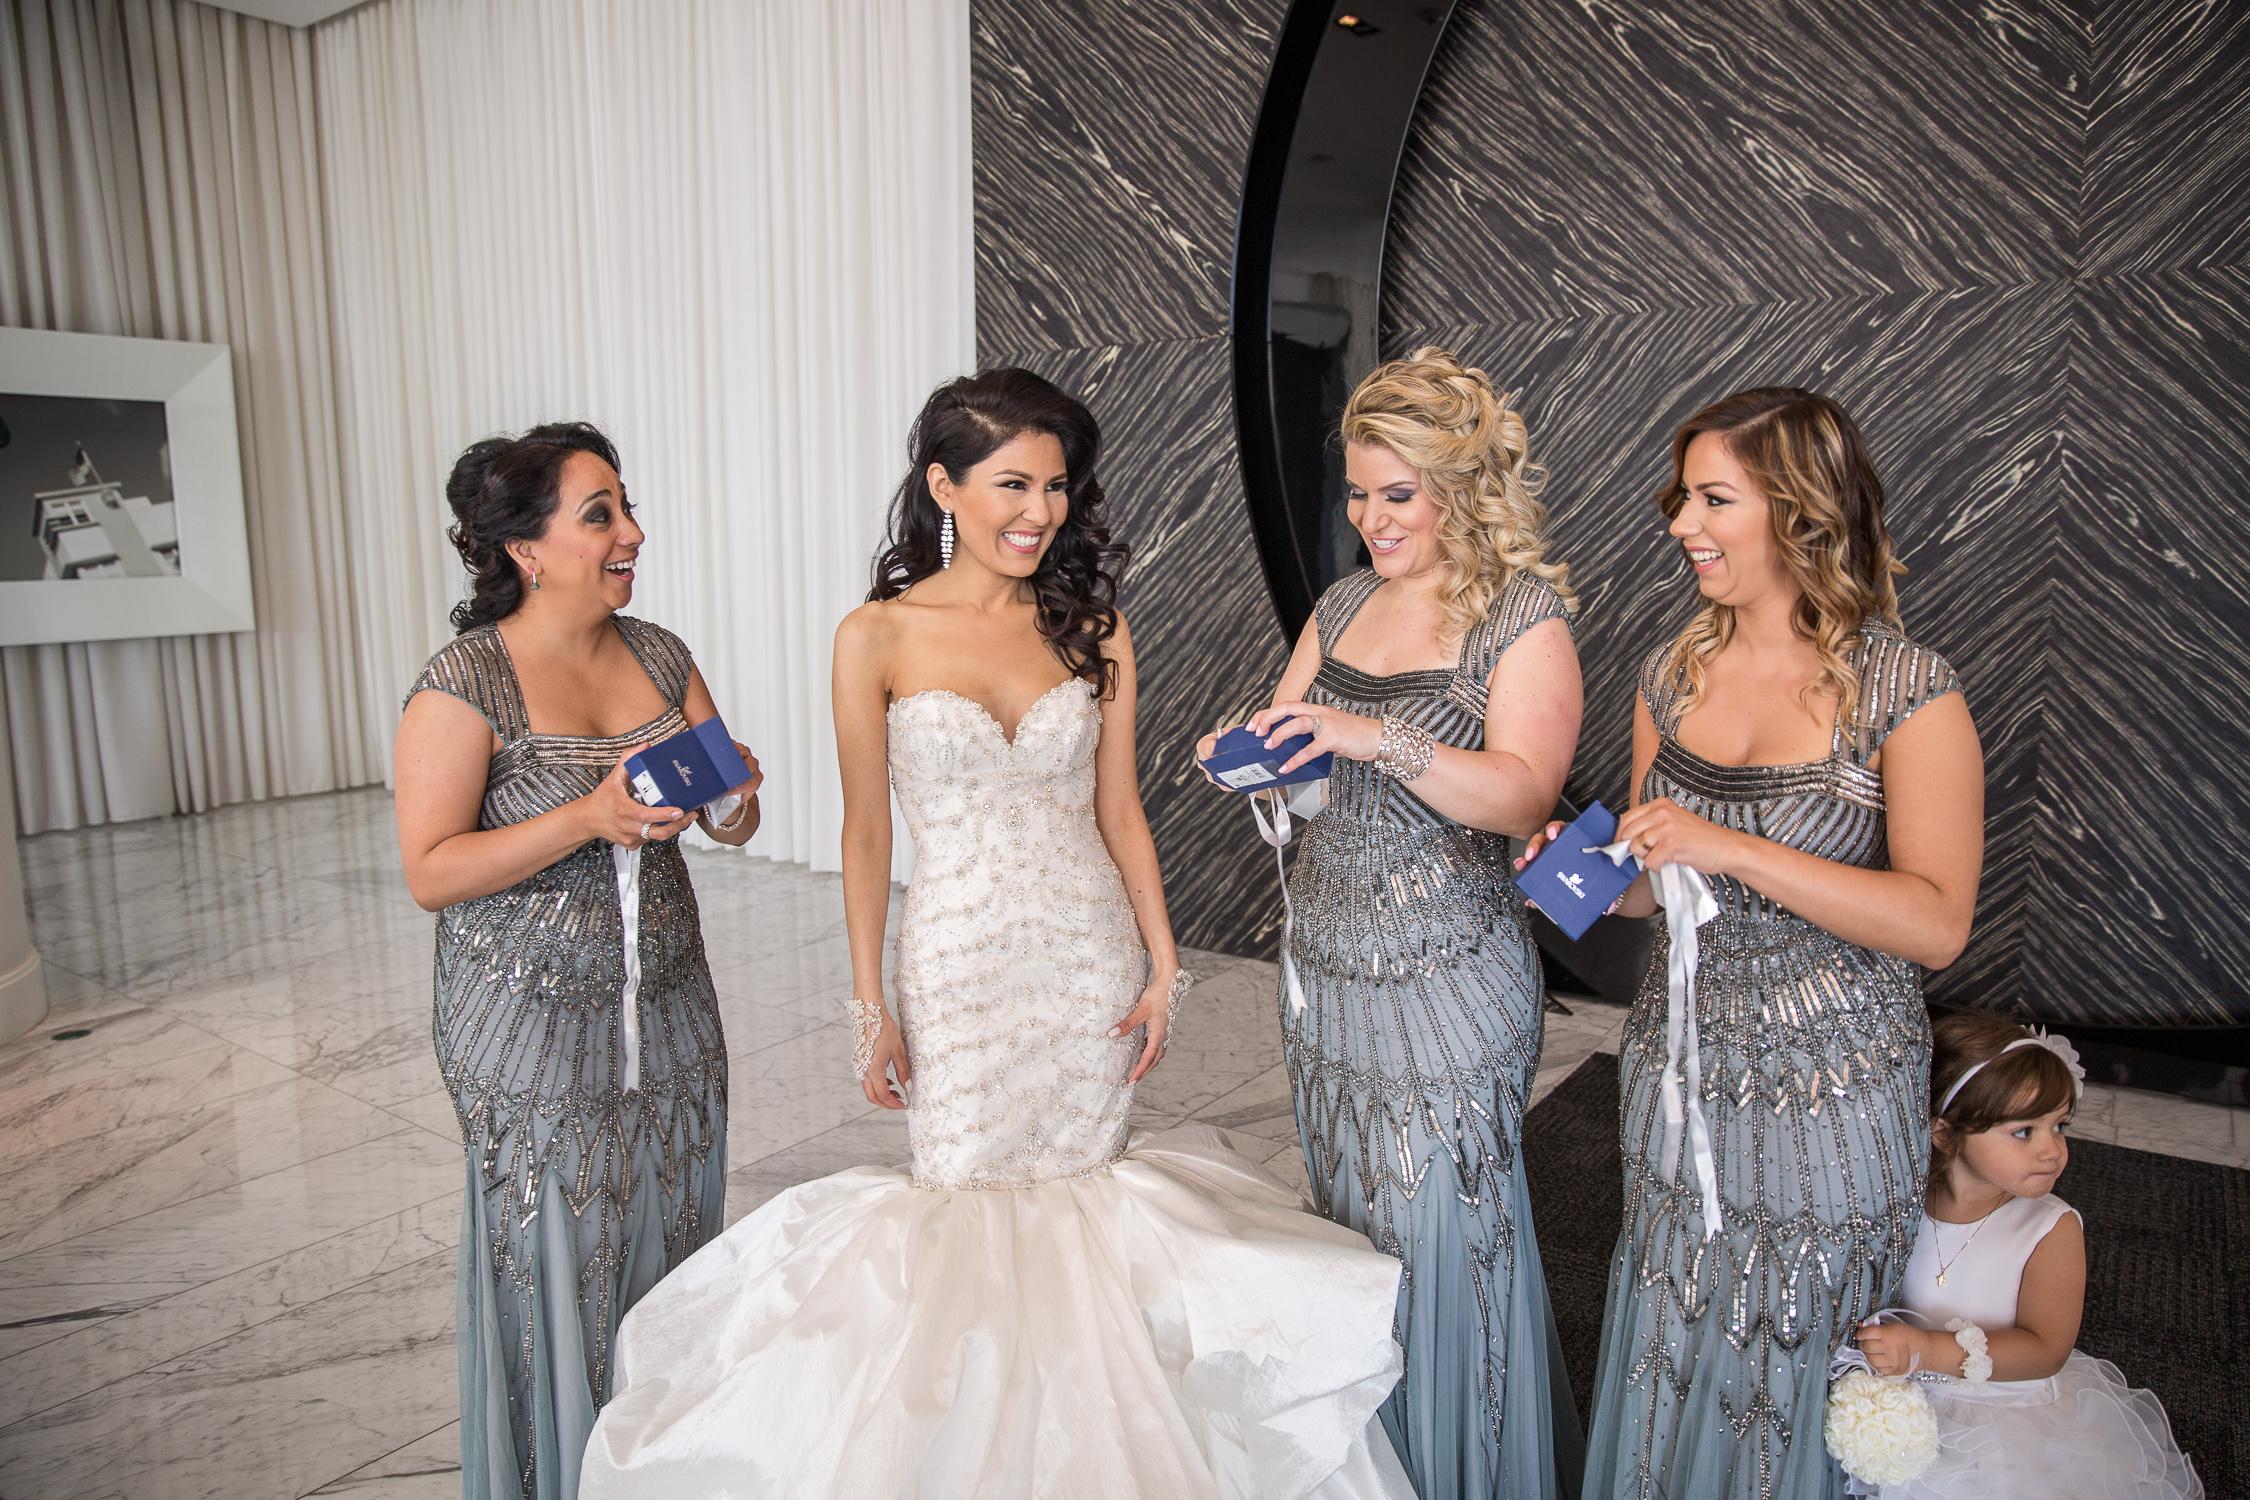 Paradise-Banquet-Hall-Wedding-Vaughan-Ontario-0014.jpg